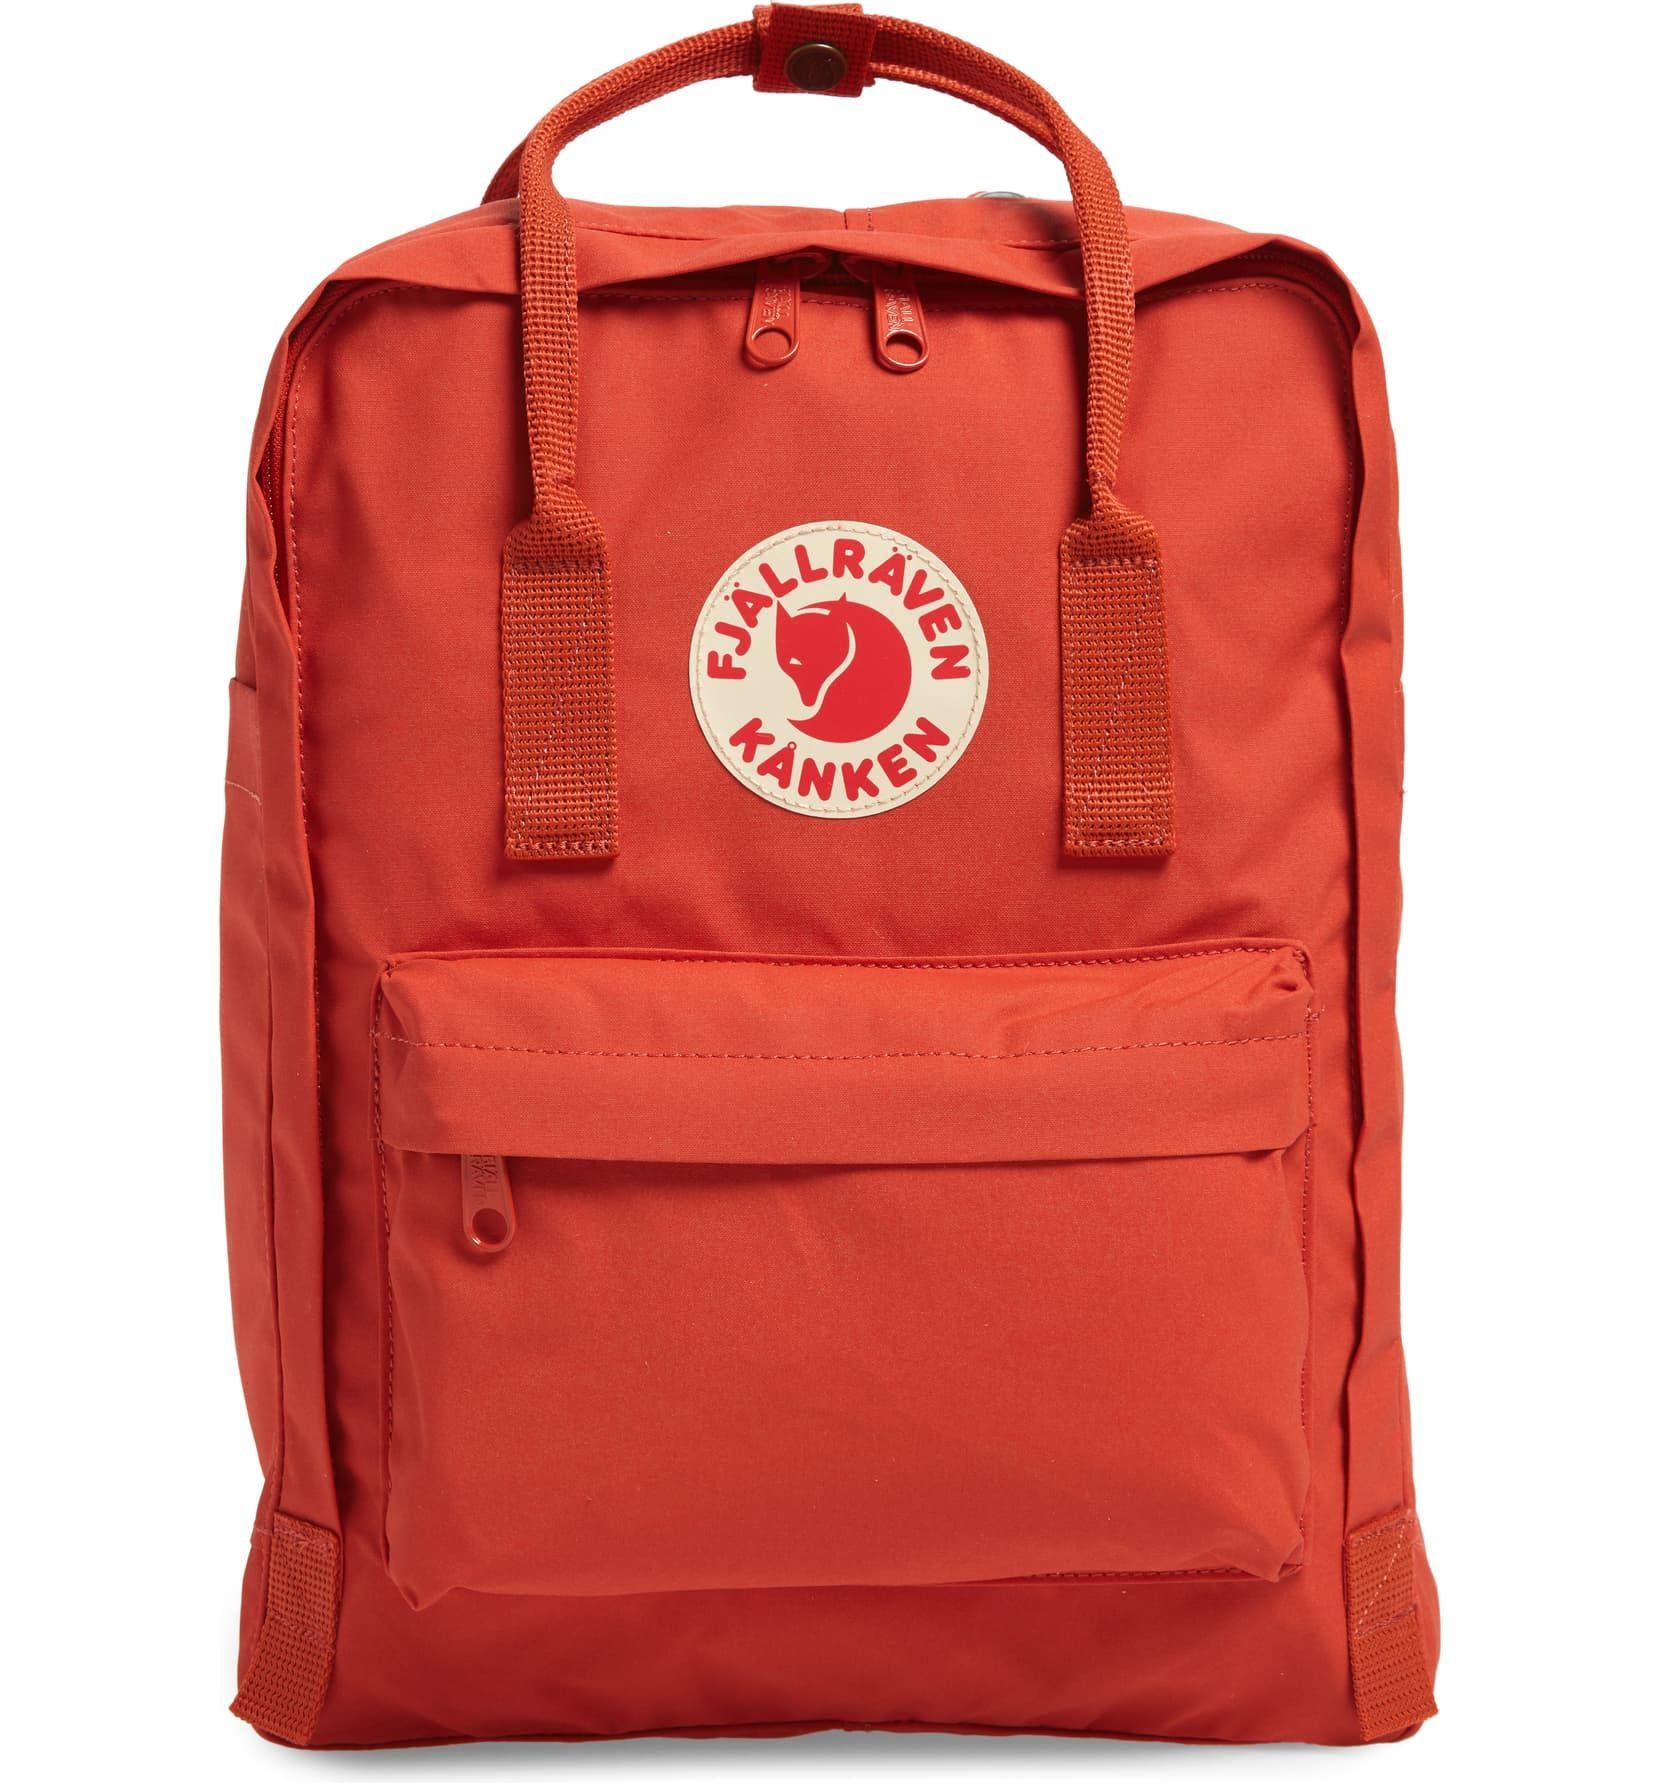 Kanken Water Resistant Backpack Fjallraven In 2020 Water Resistant Backpack Backpacks Kanken